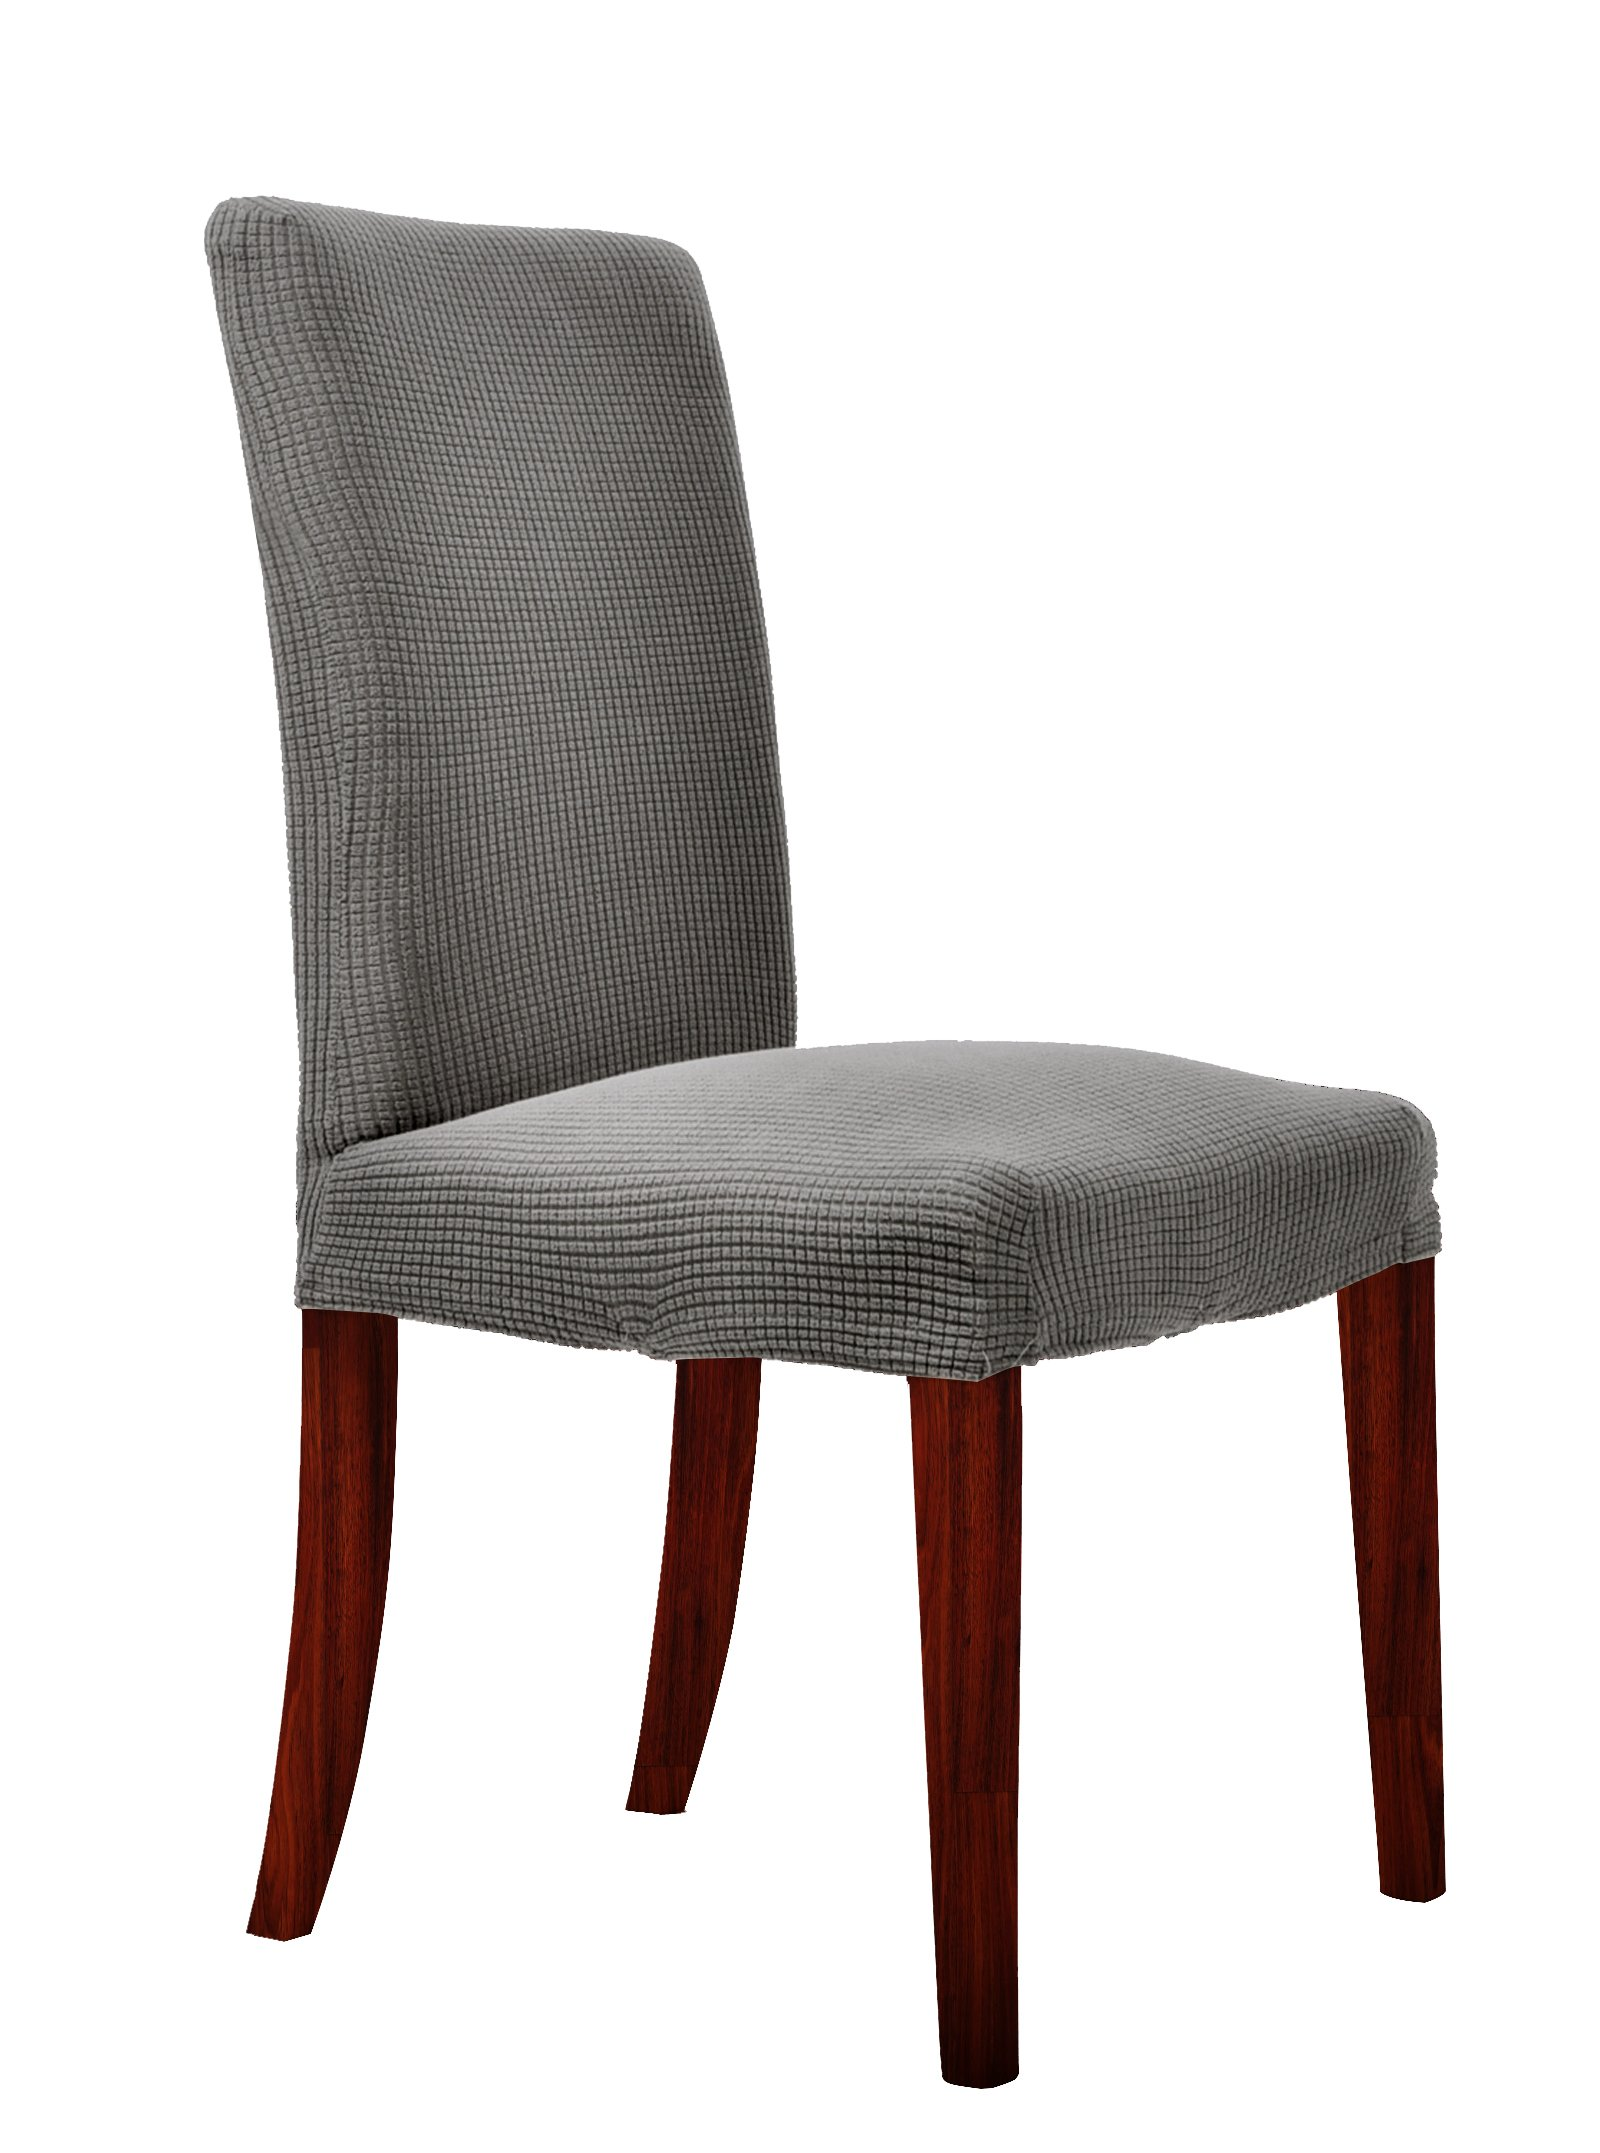 Chunyi Waterproof Jacquard Polyester Spandex Small Checks Dining Chair Covers (4Piece, Gray)